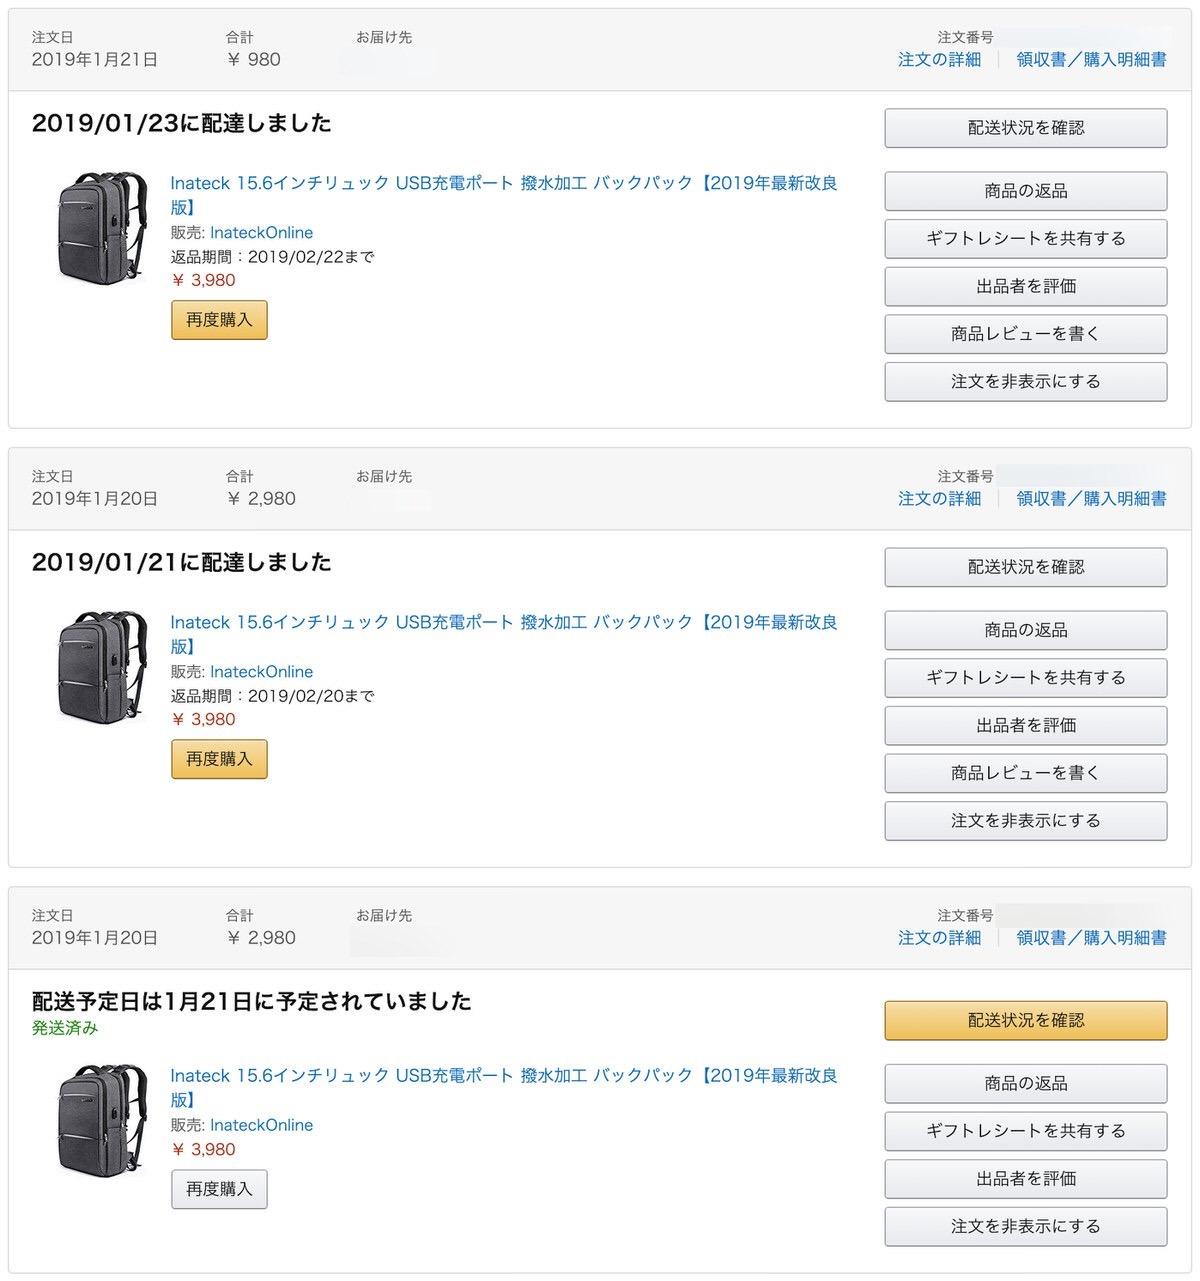 Inateck 15.6インチリュック USB充電ポート 撥水加工 バックパック−1